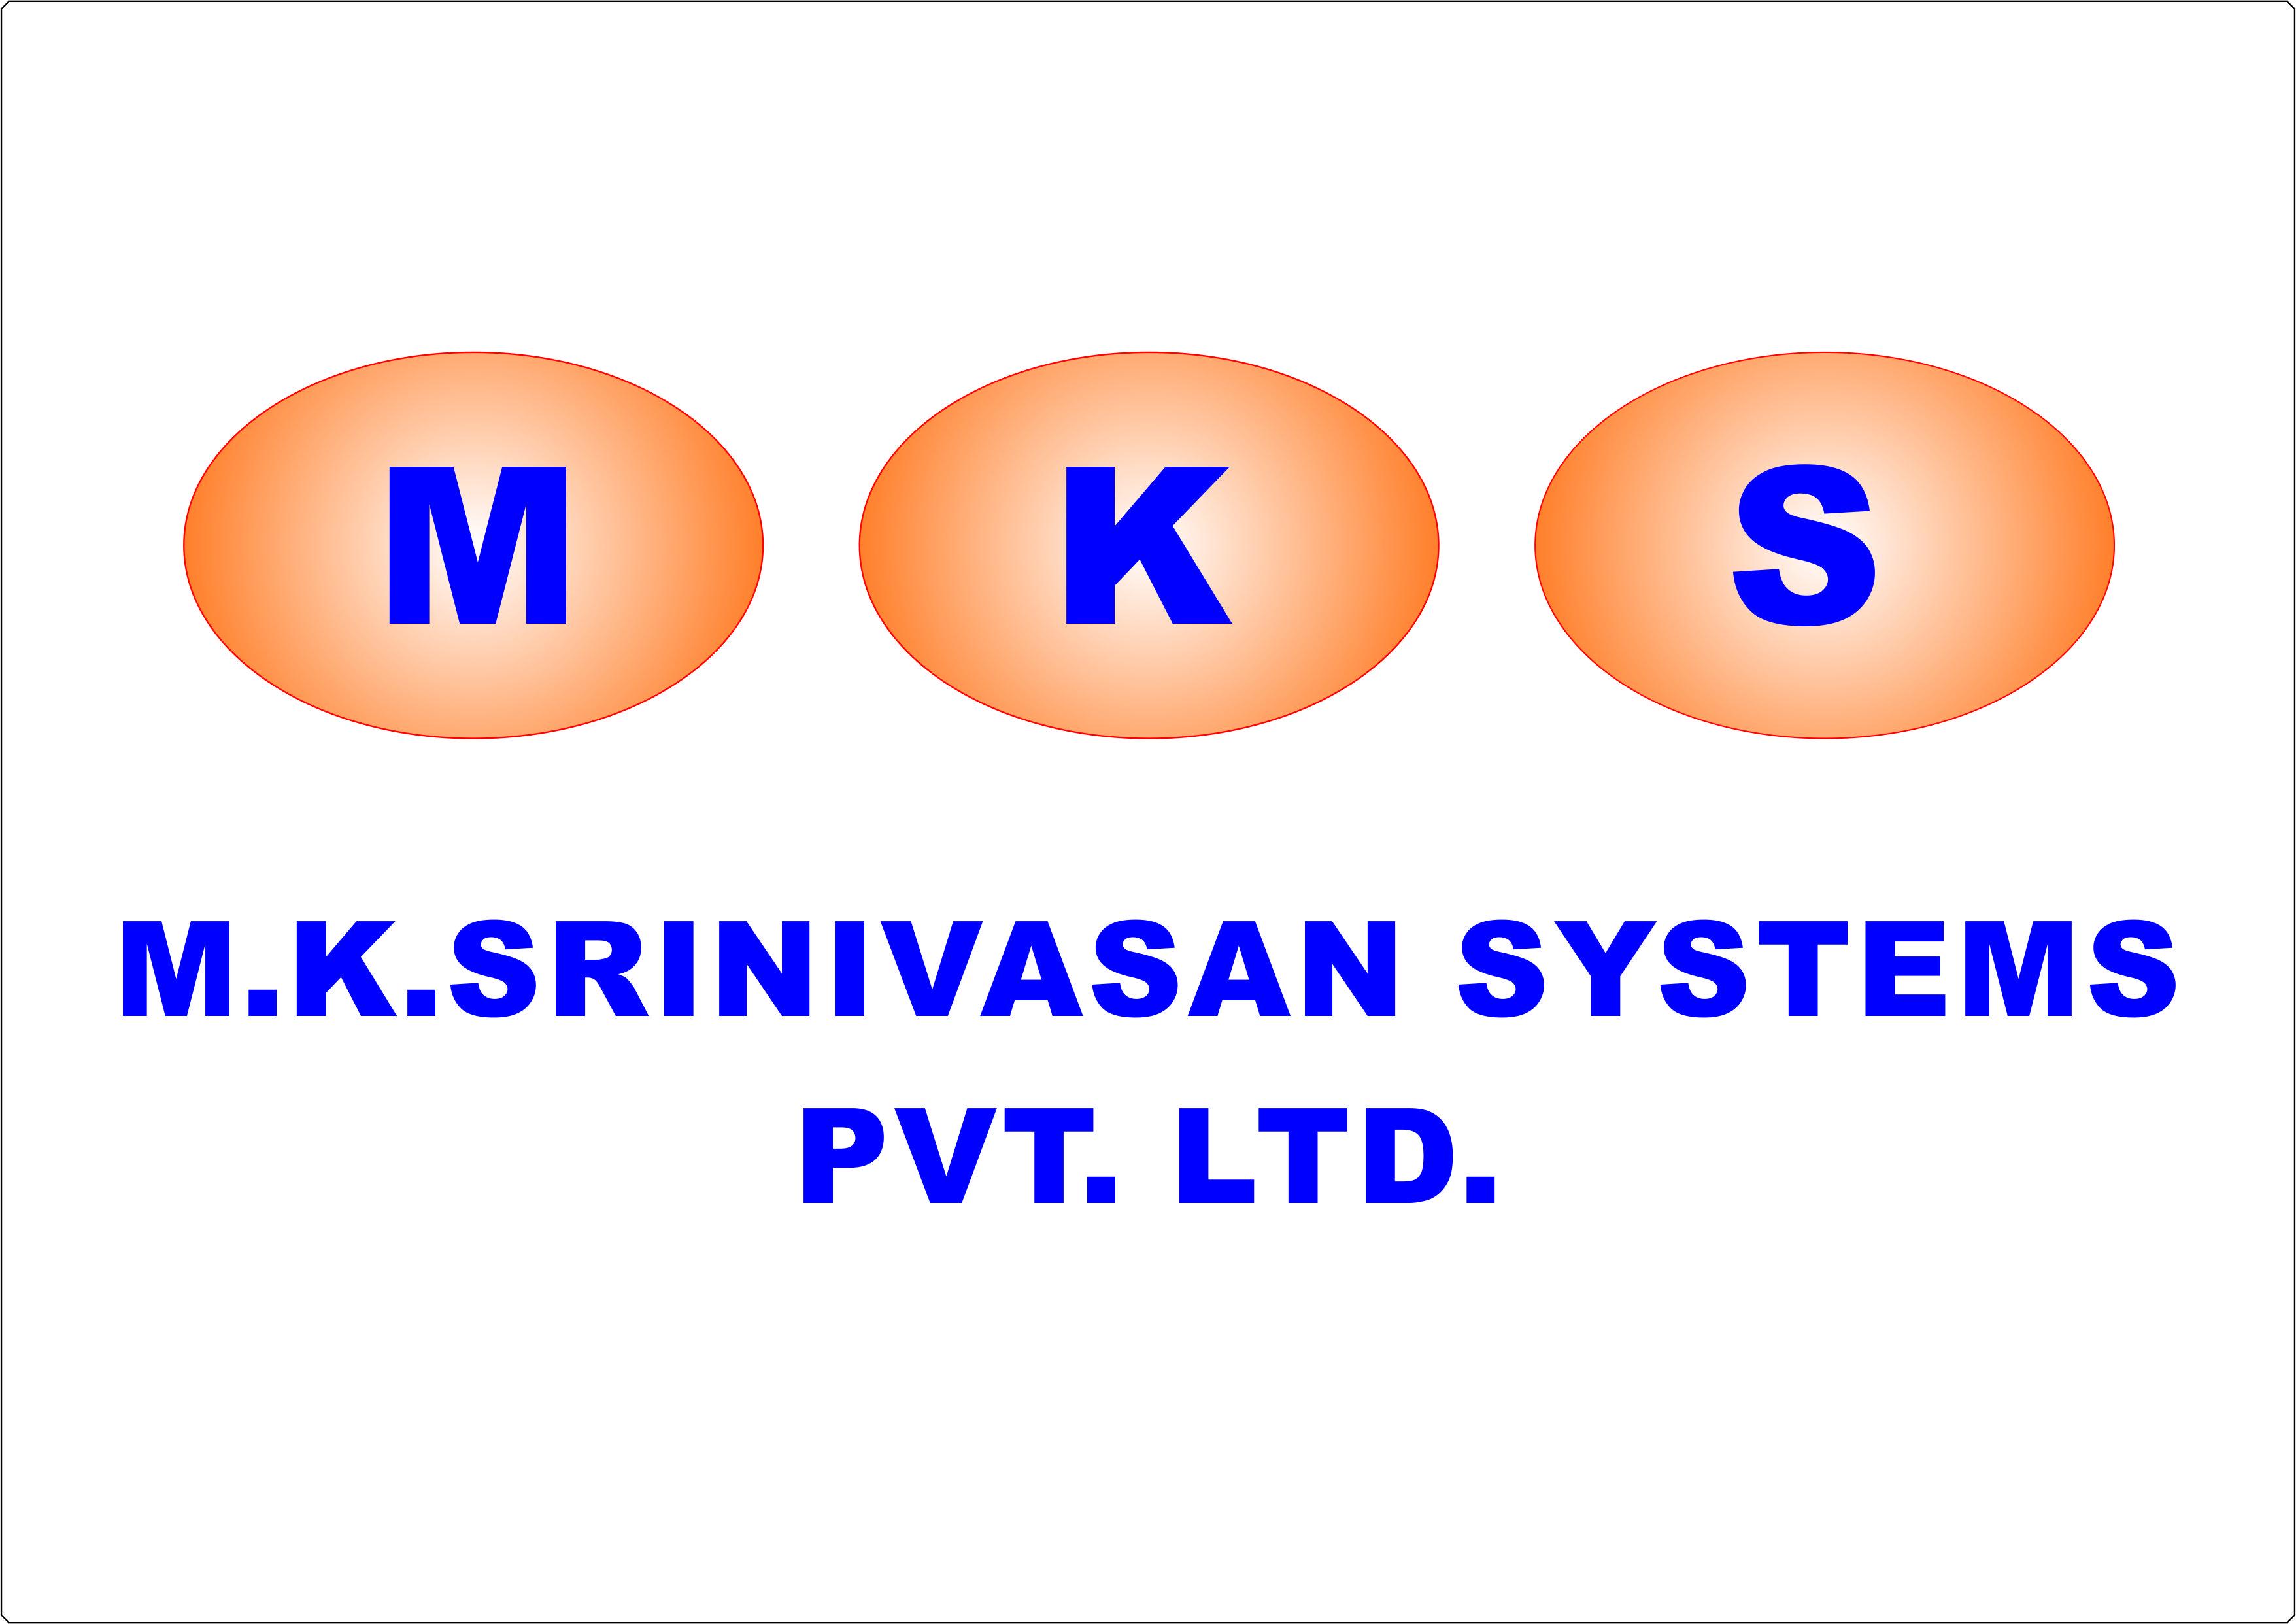 M.K.SRINIVASAN SYSTEMS PVT. LTD.